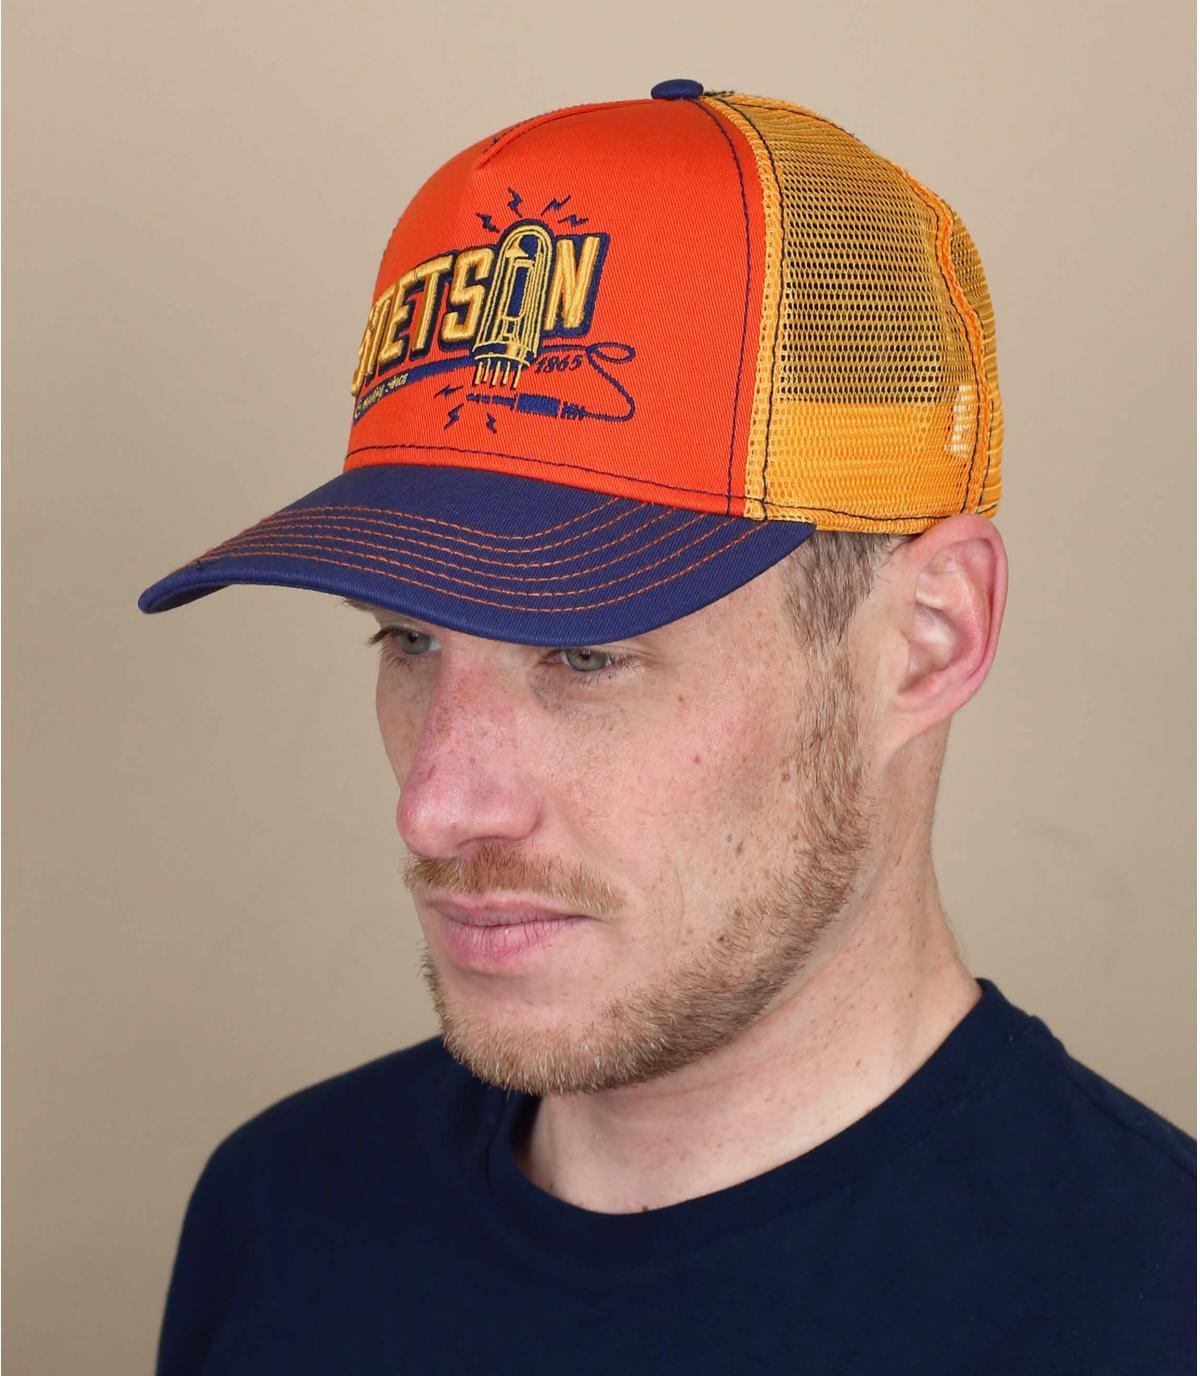 Stetson orange trucker cap